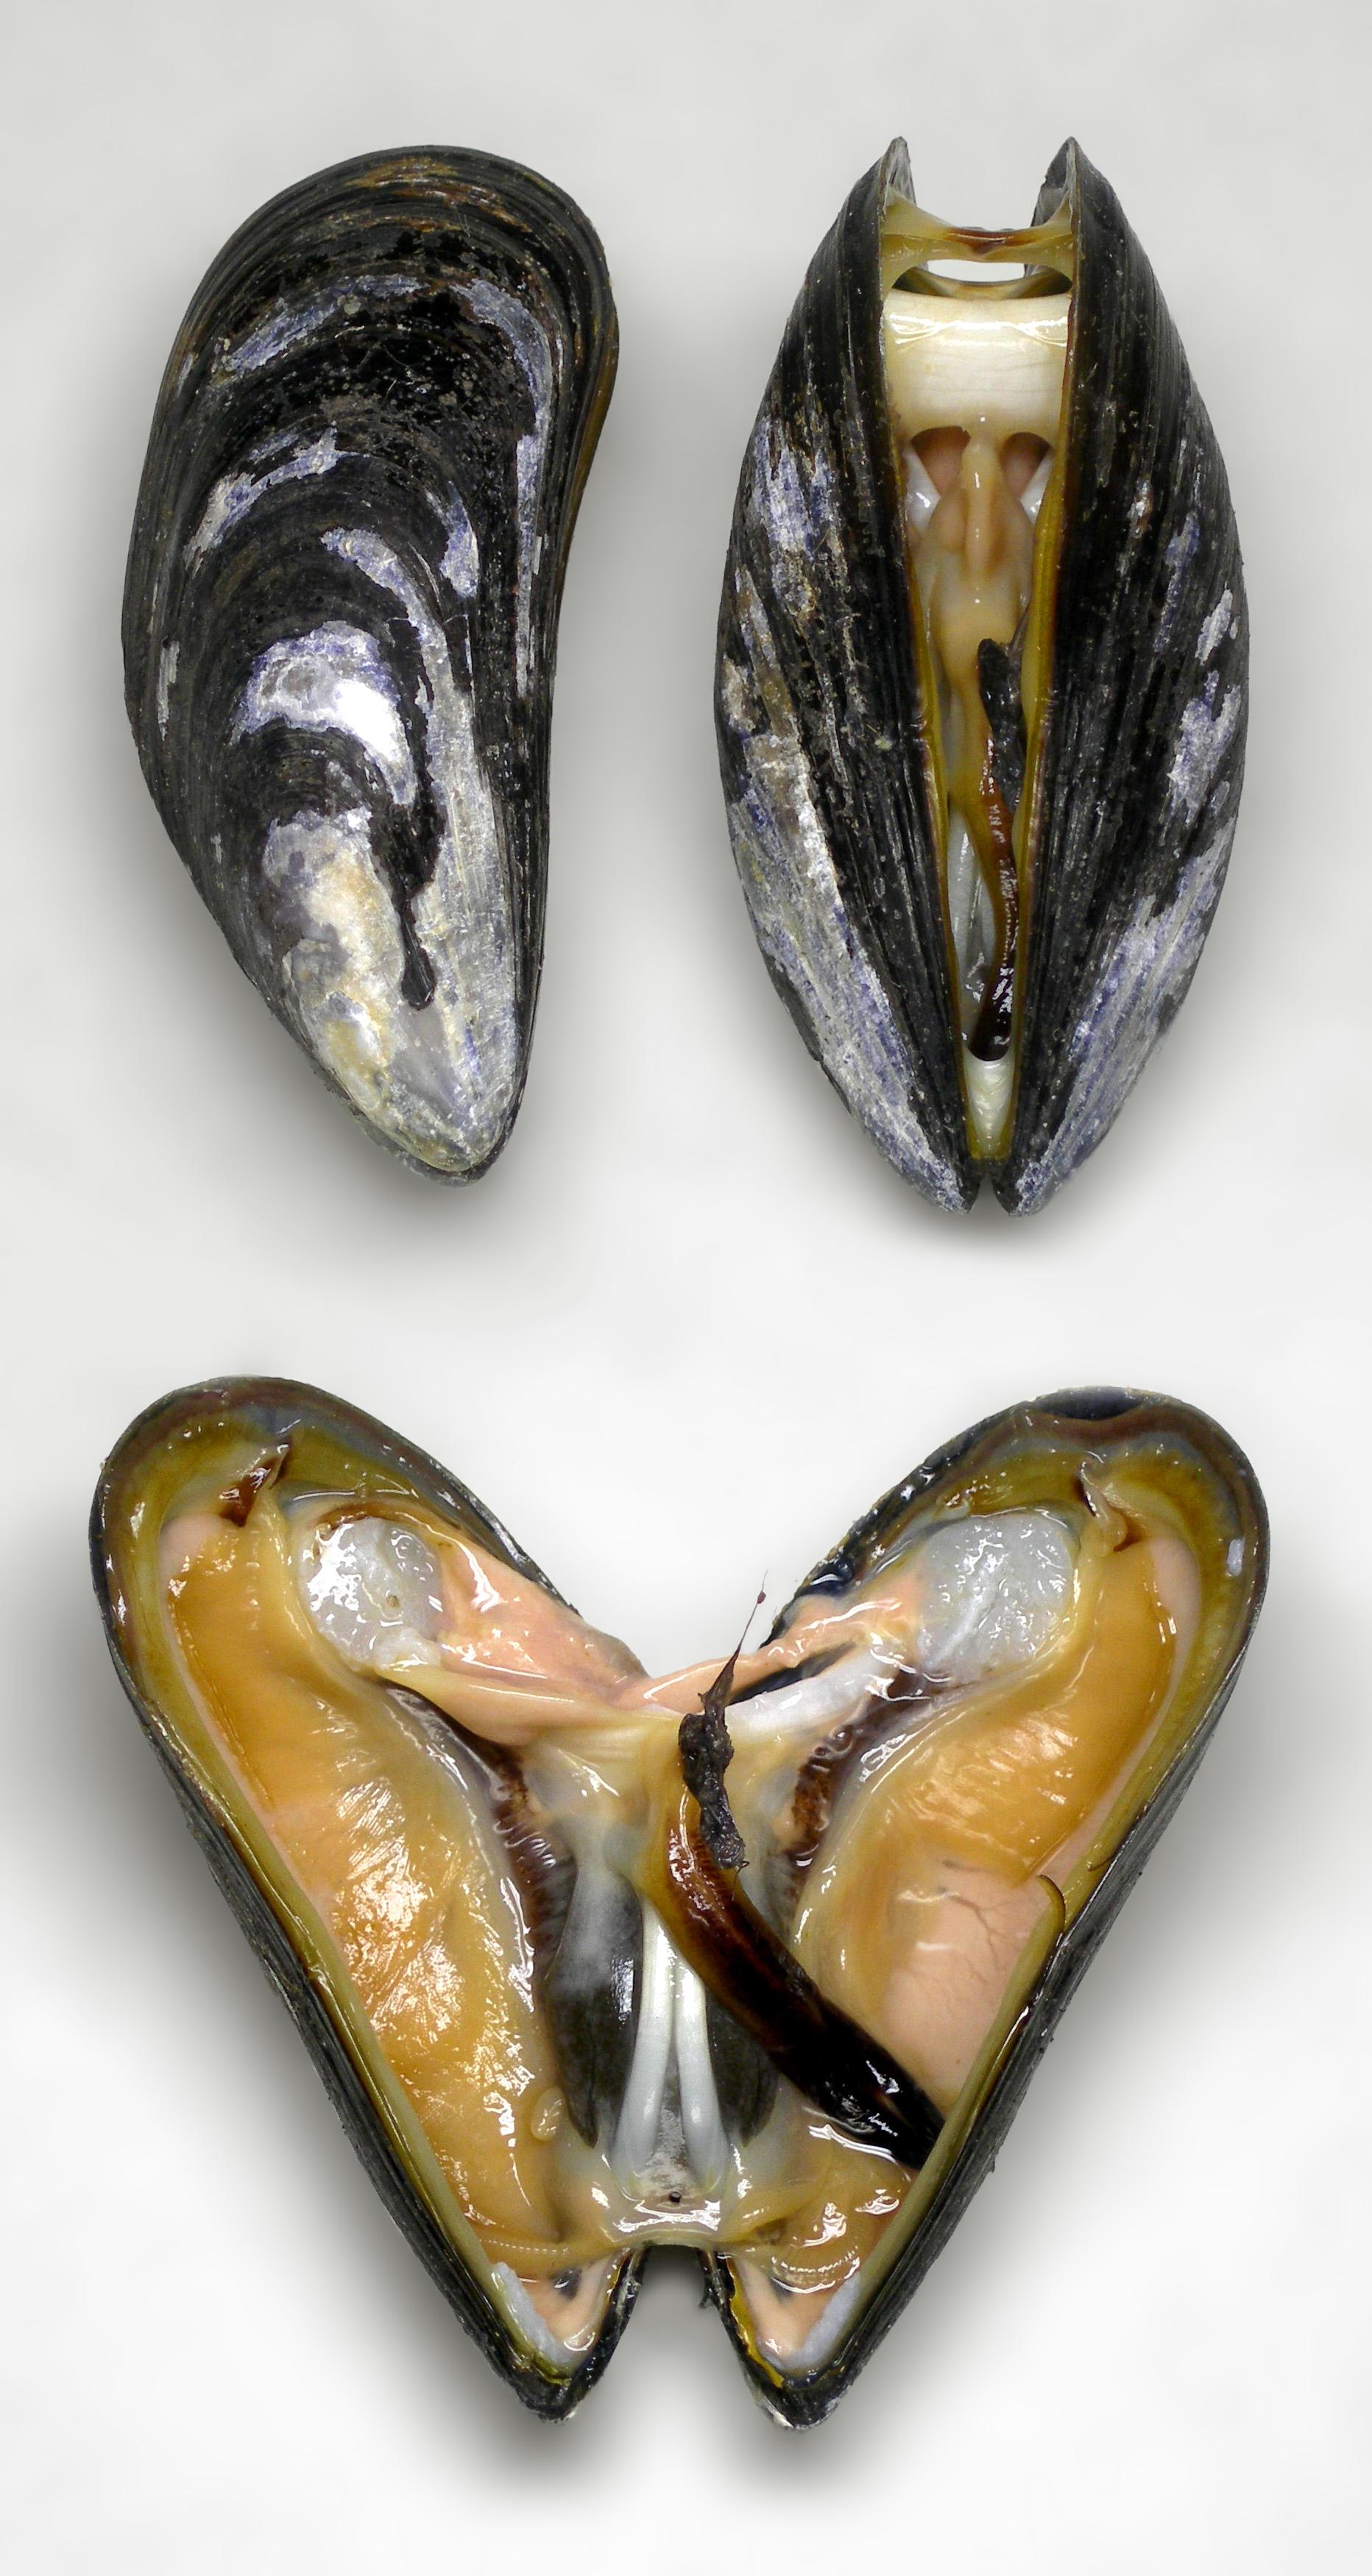 Blue Mussel Wikipedia